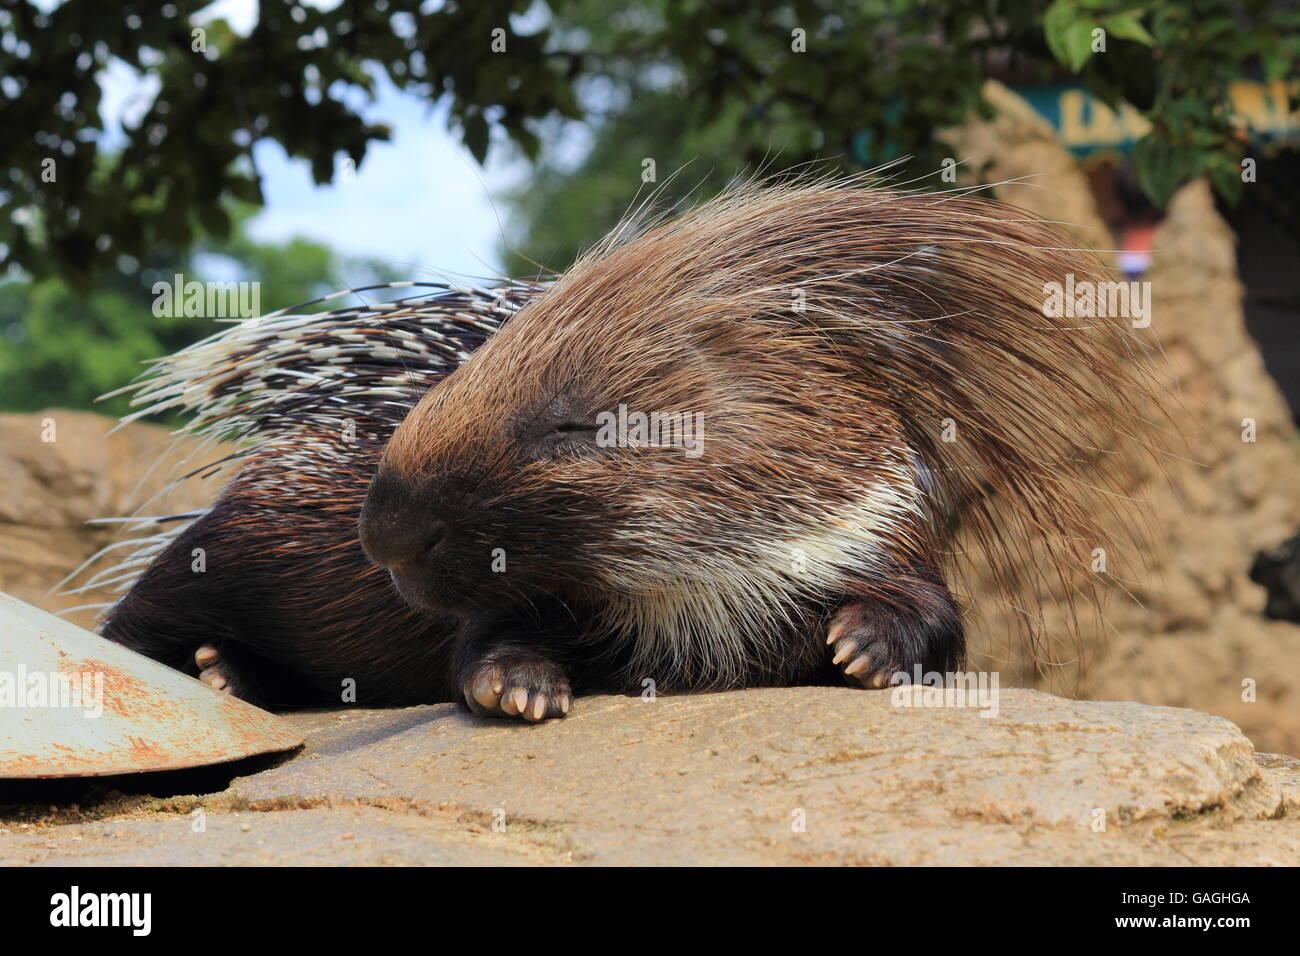 Porcupine sunbathing at Cotswold Wildlife Park Stock Photo